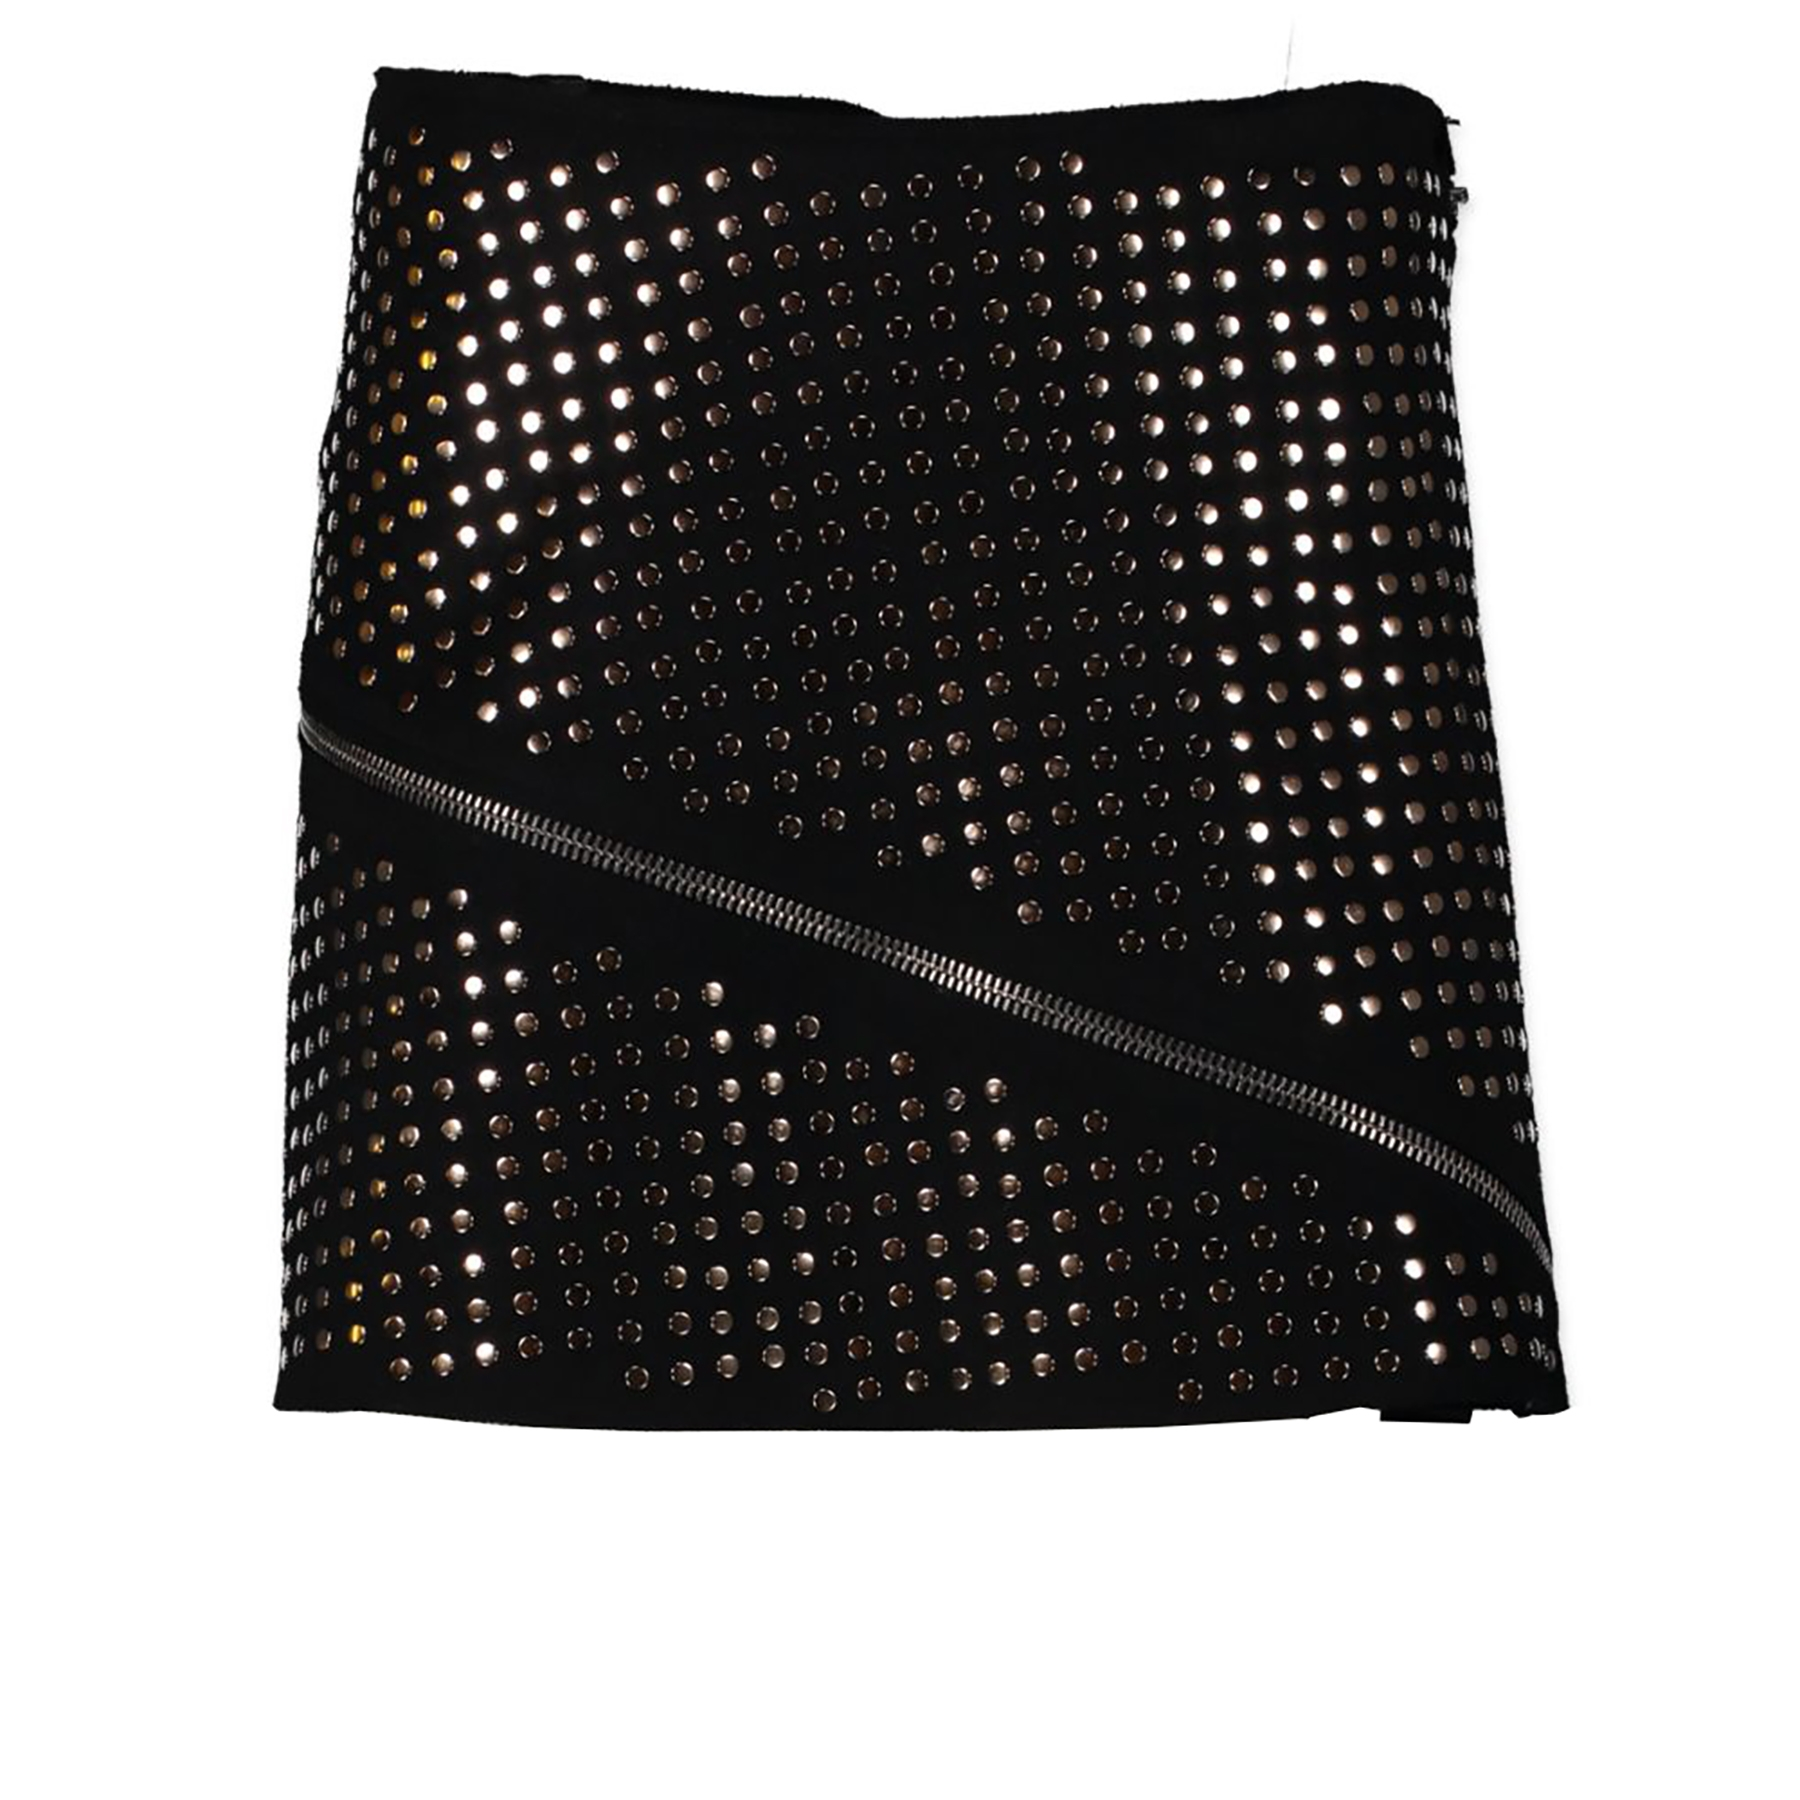 Authentic secondhand Roberto Cavalli Black Wool Studs Skirt - Size 42 designer clothing designer brands fashion luxury vintage webshop